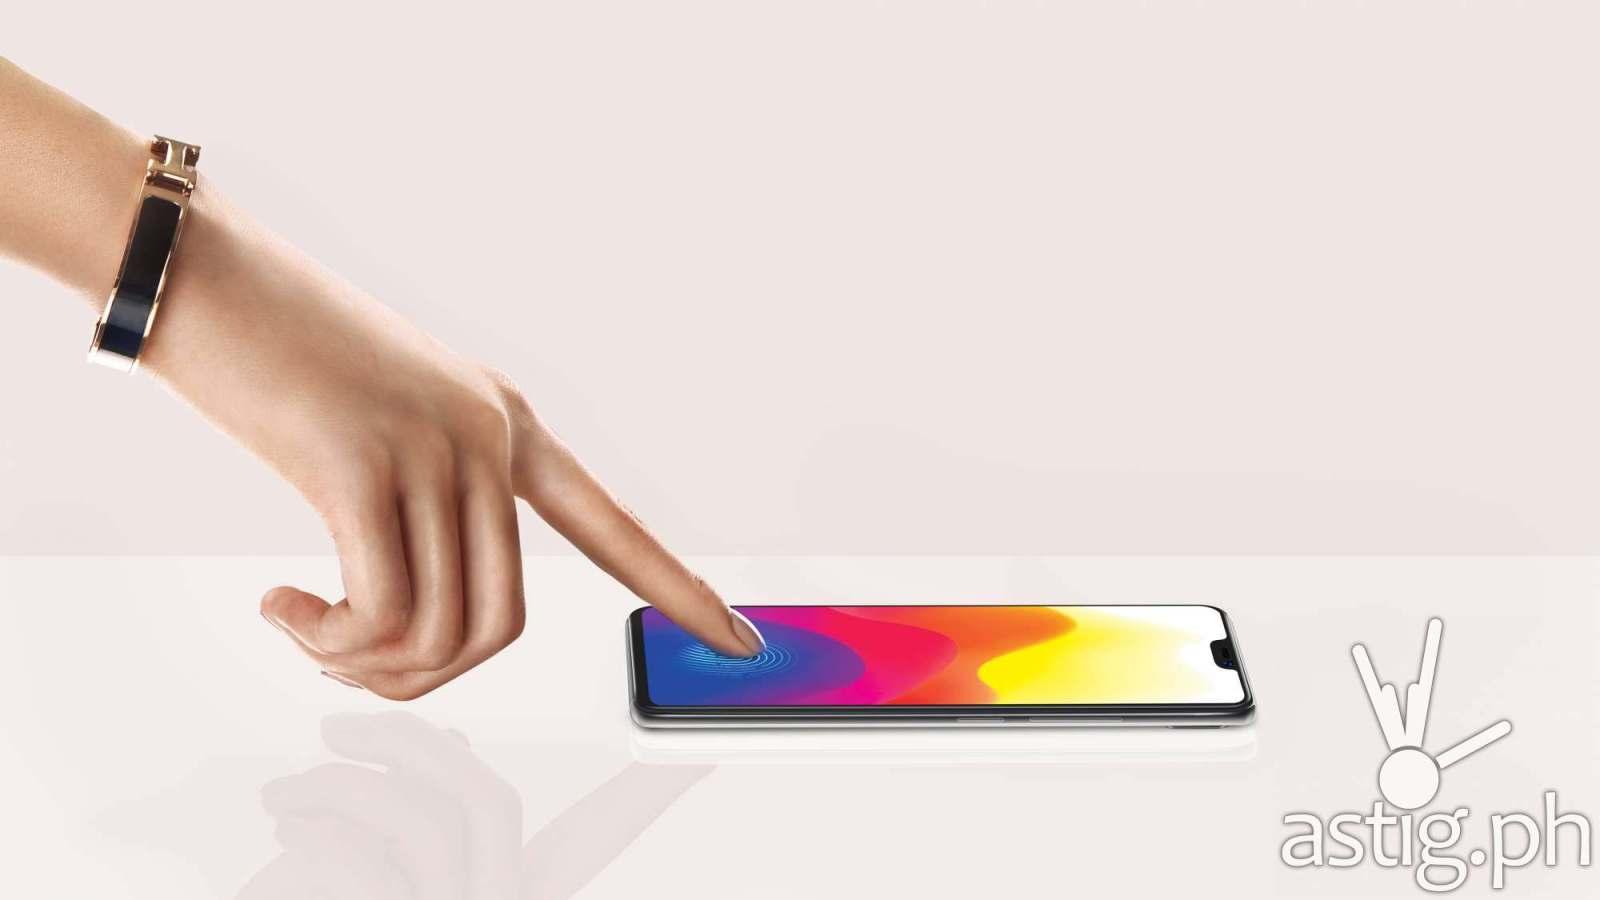 Vivo X21 in-display fingerprint reader